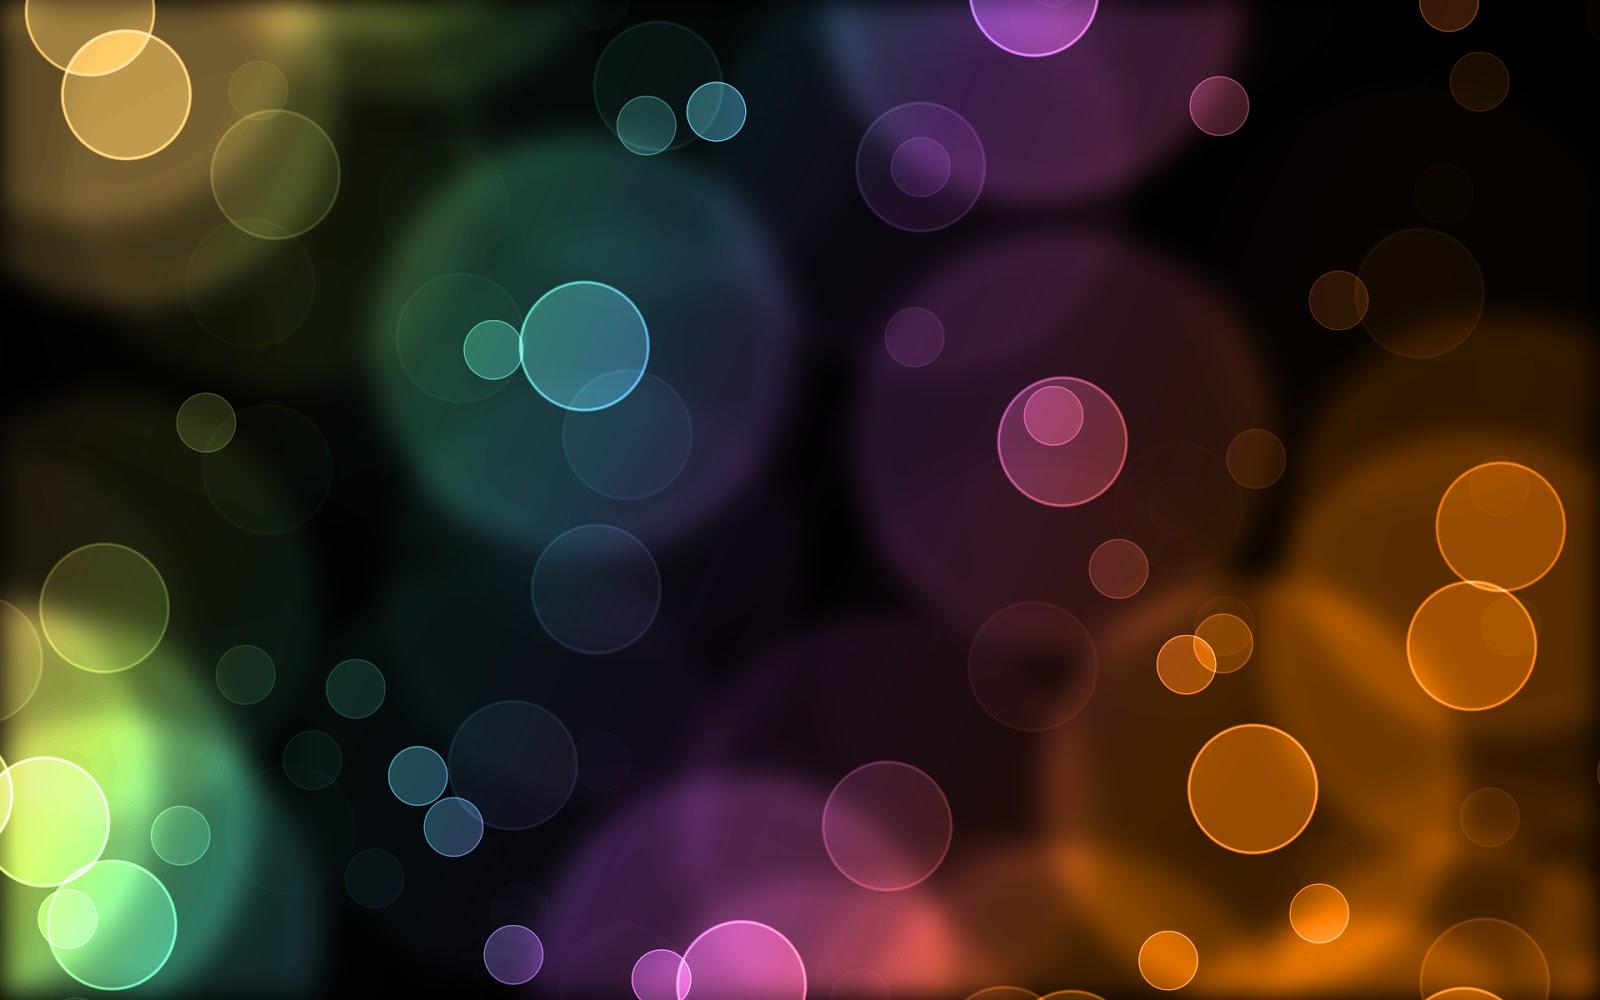 Imagenes de fondo bonitas imagui for Imagenes bonitas para fondo de pantalla